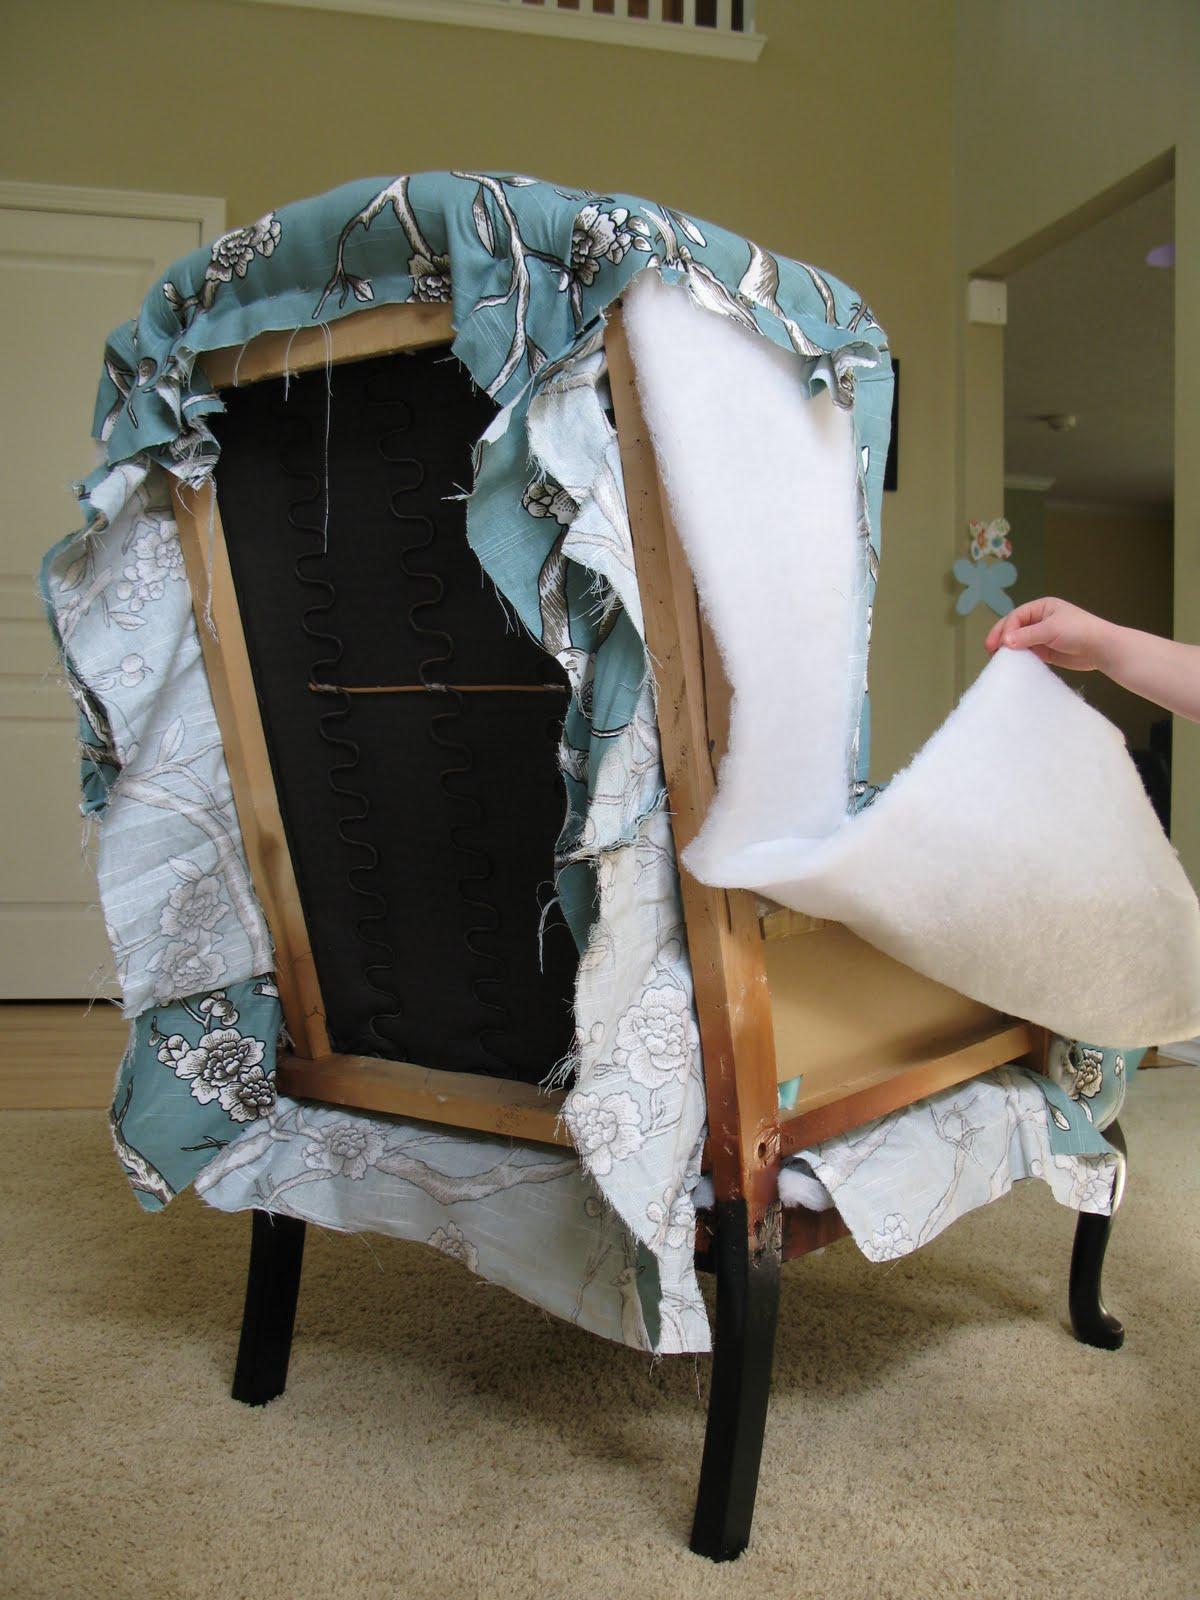 Diy Sofa Reupholstering Catnapper Lay Flat Reclining Modest Maven Vintage Blossom Wingback Chair